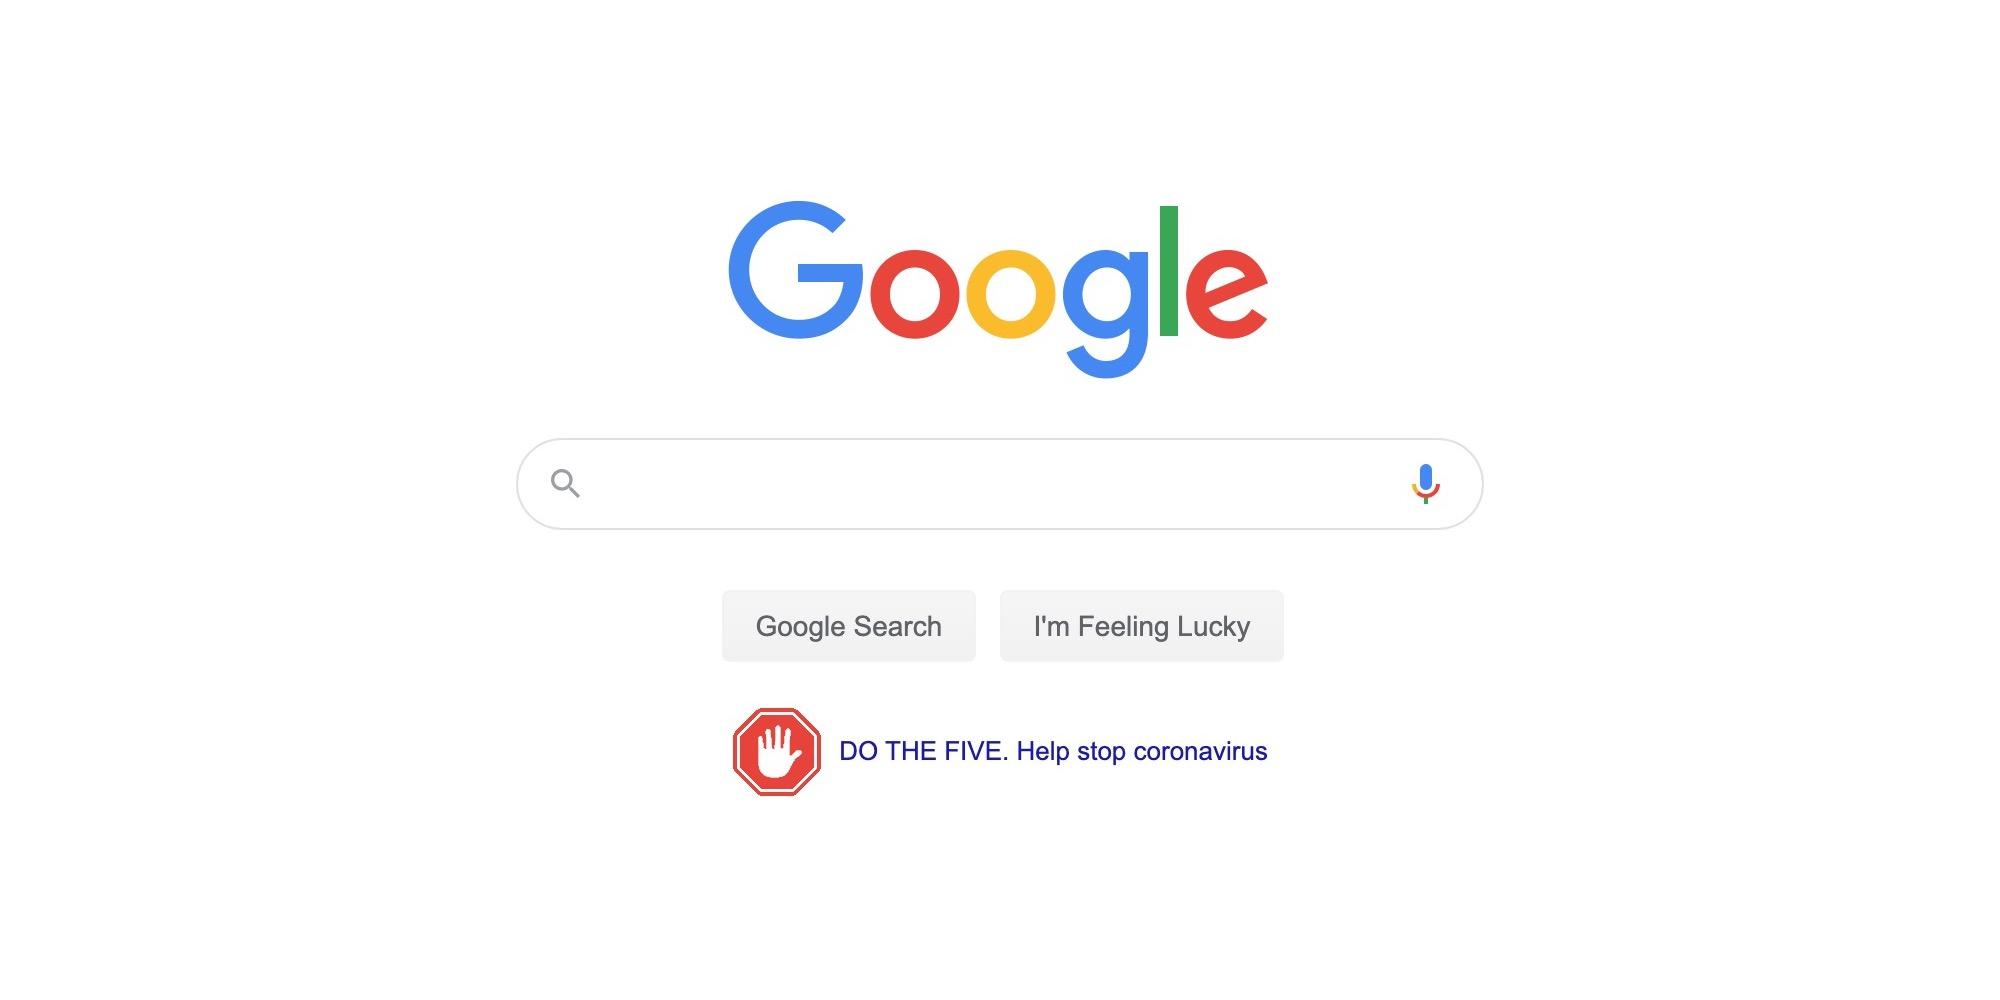 Google sends out 'Help stop coronavirus' tips in prominent PSA push thumbnail